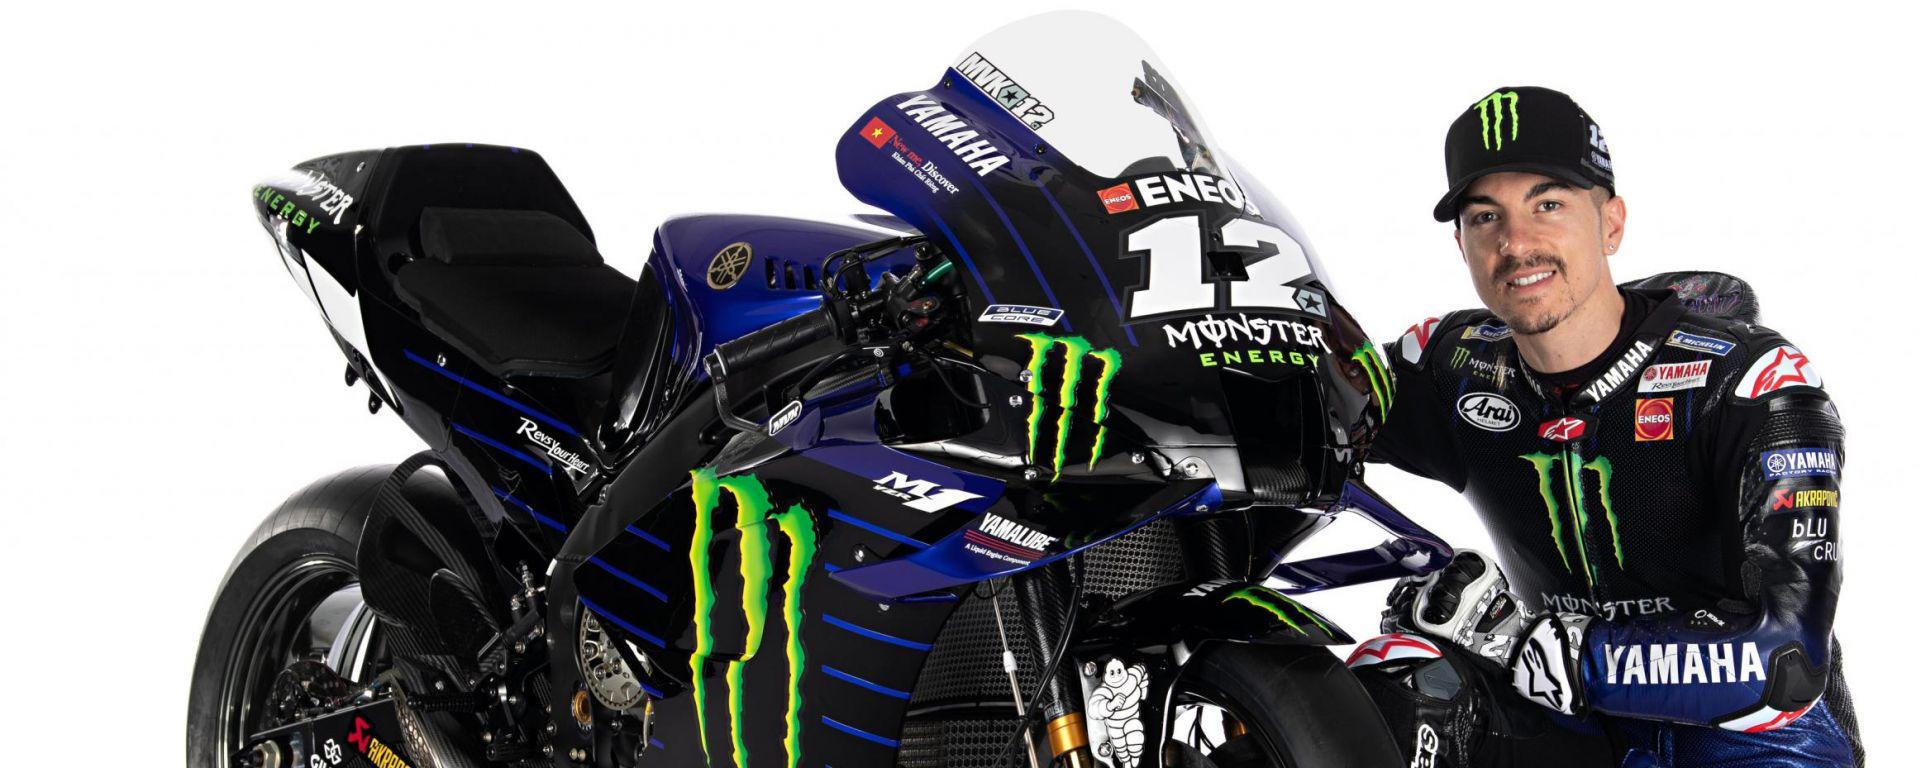 MotoGP 2020, Monster Energy Factory Yamaha , Yamaha YZR-M1: Maverick Vinales